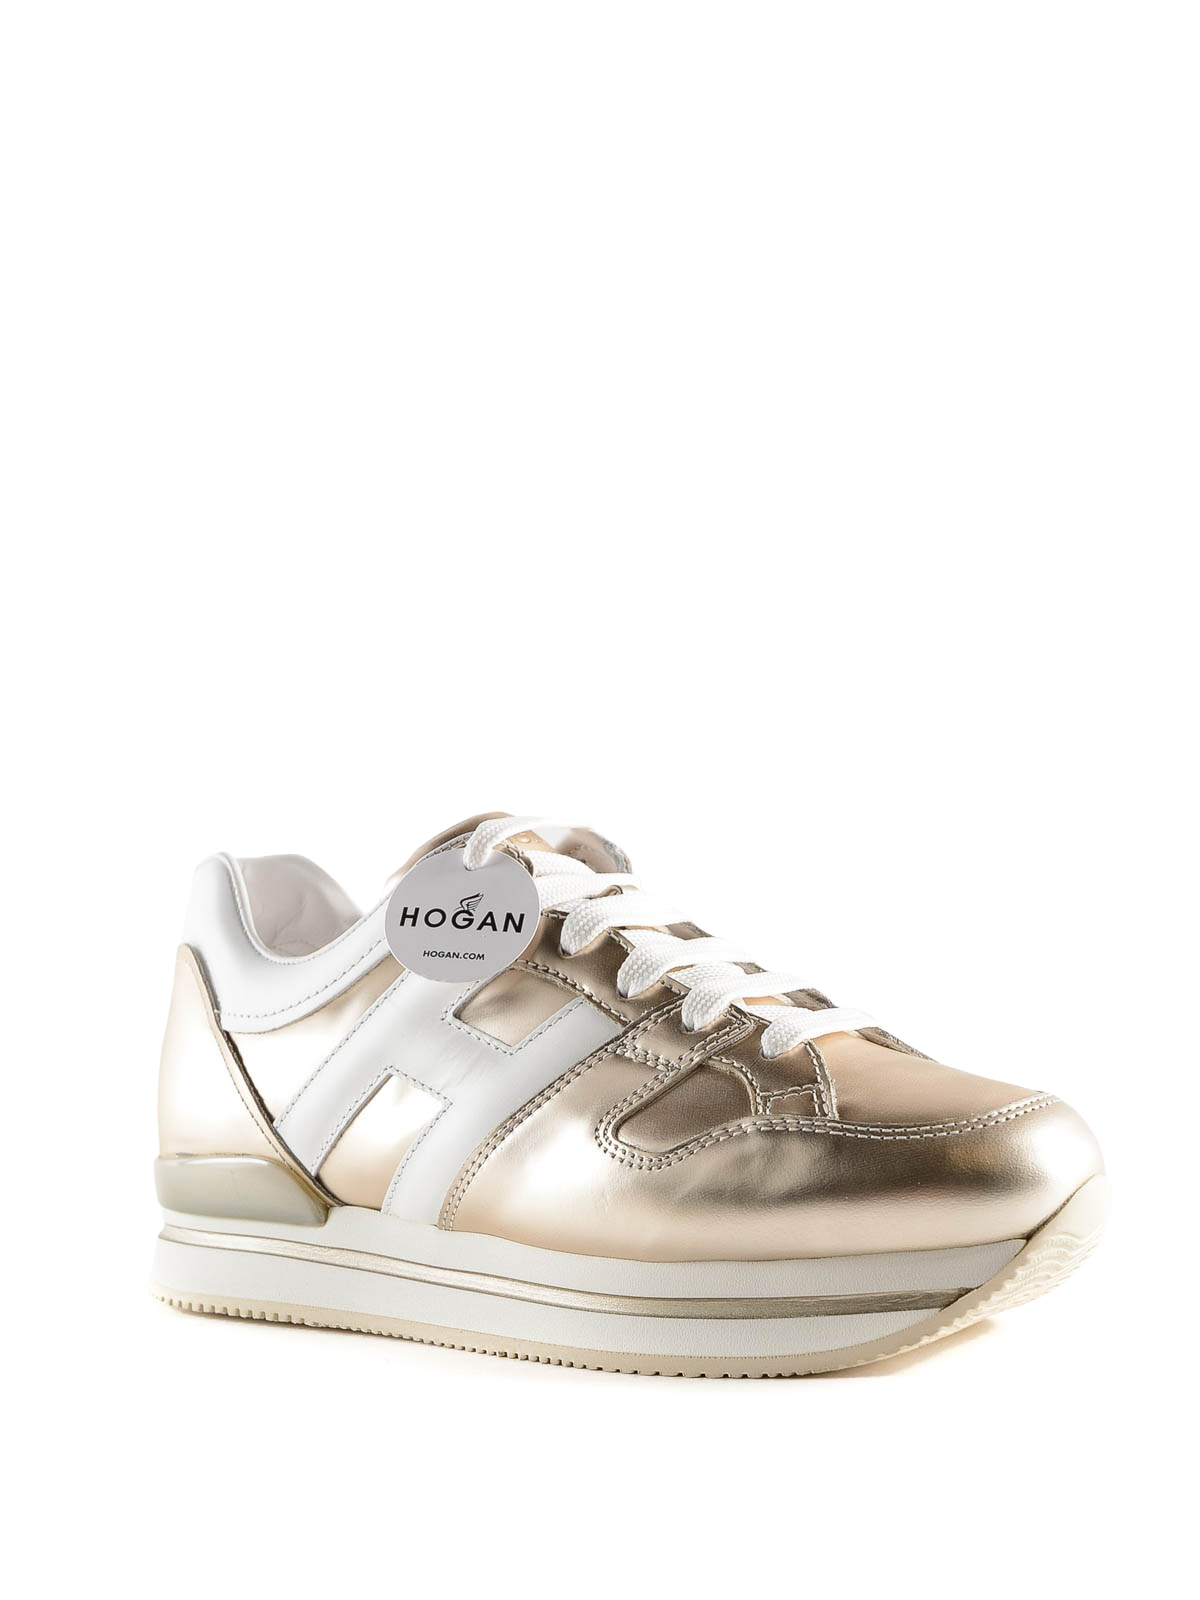 Hogan - Sneaker bronzo in pelle con suola a righe - sneakers ...